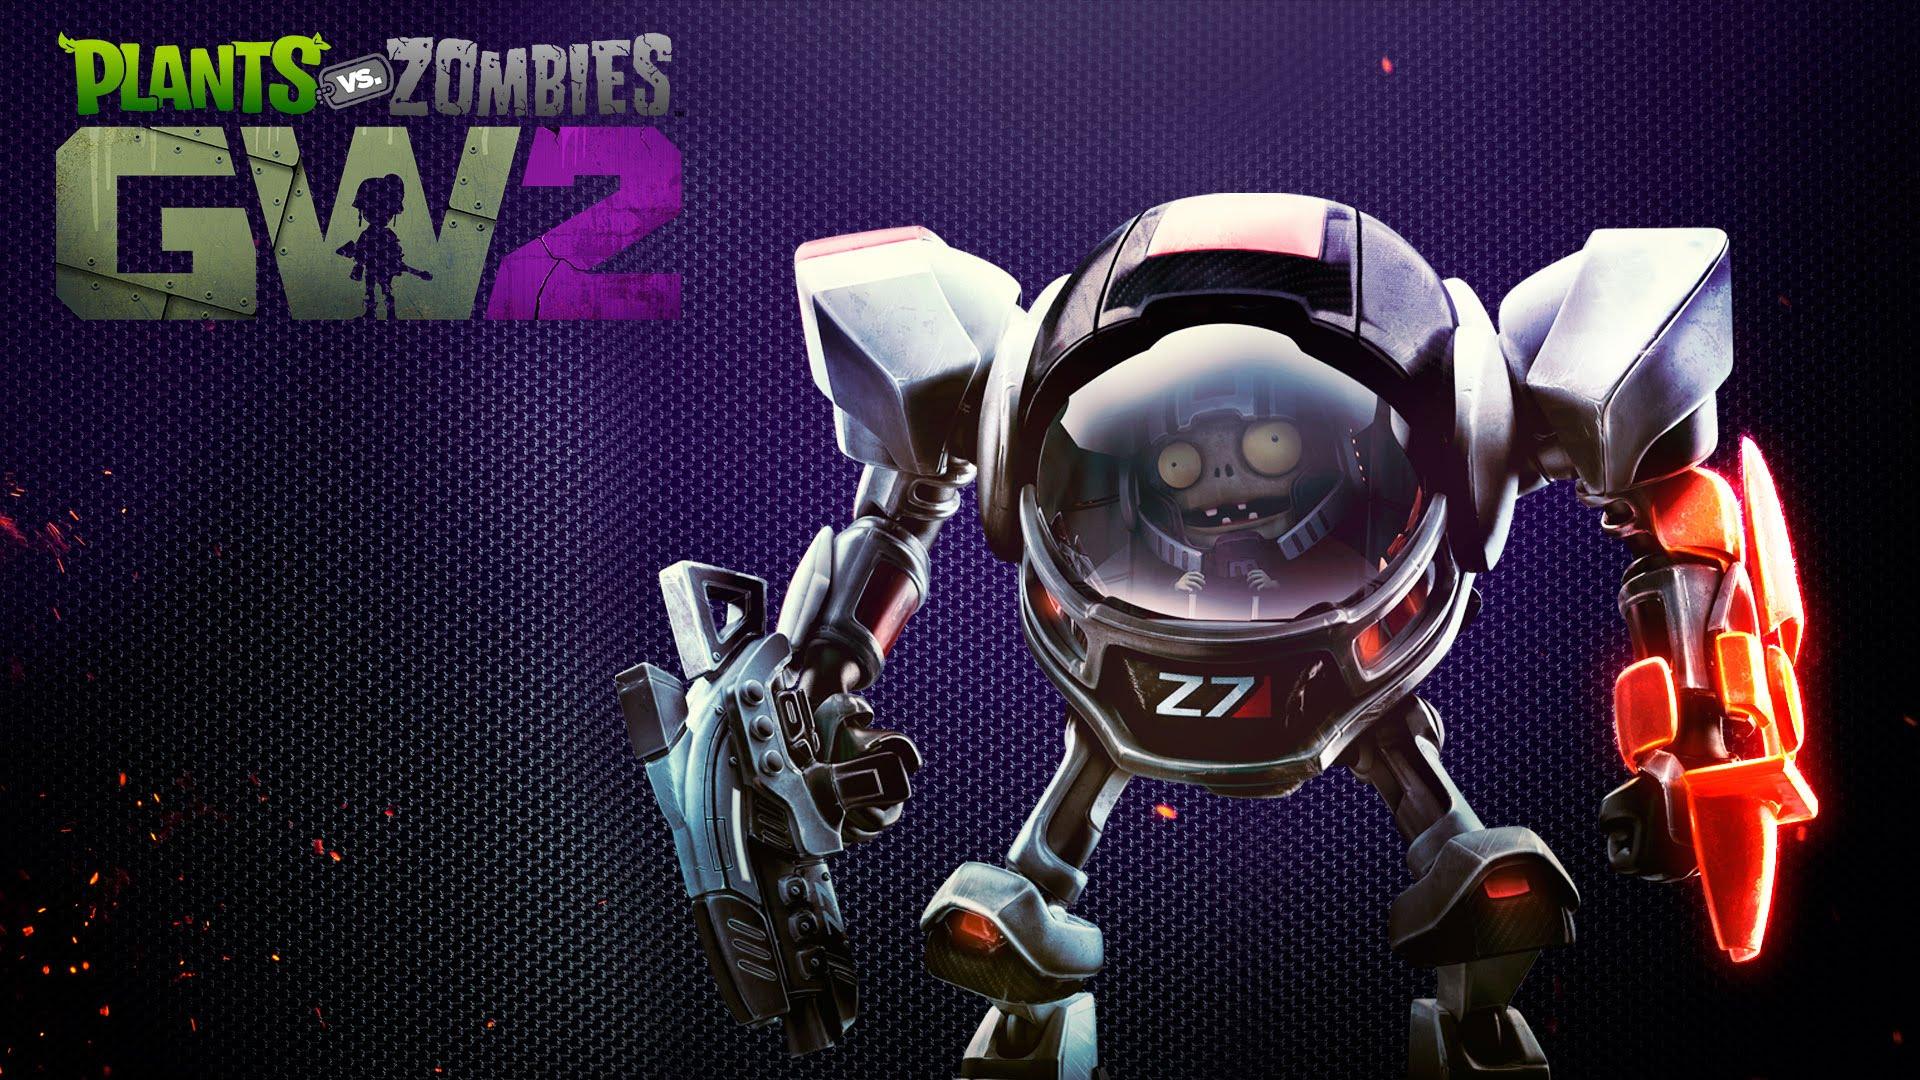 Plants vs. Zombies: Garden Warfare 2 Desktop wallpapers